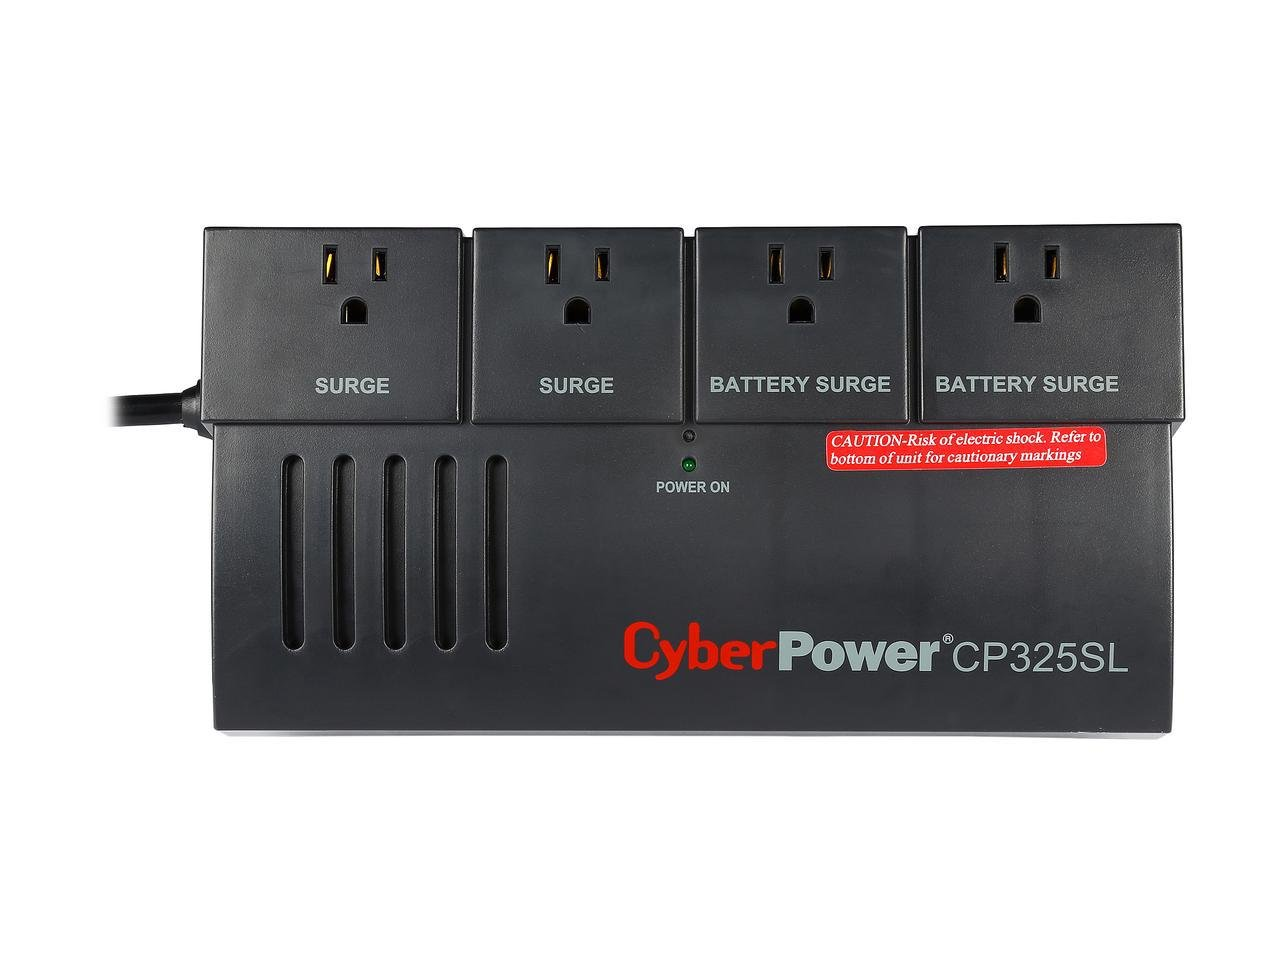 CyberPower CP325SL 325 VA 185 Watts UPS Battery Backup System